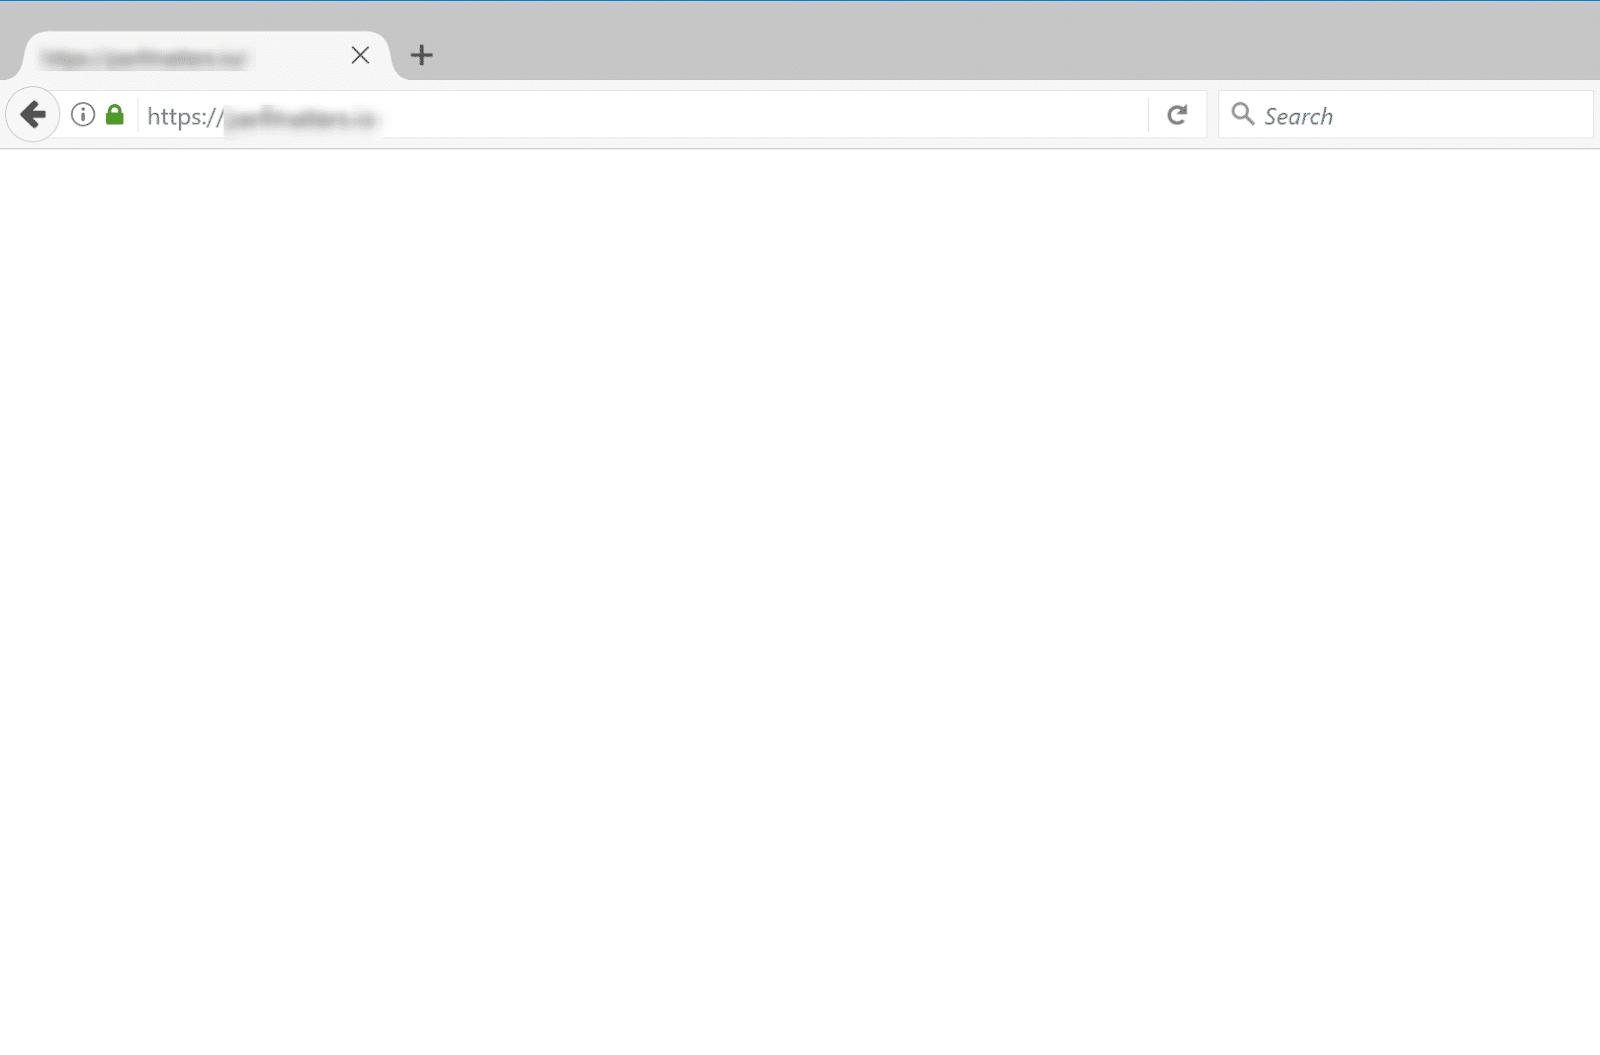 Mozilla FirefoxにおけるWordPressの「死の真っ白画面」